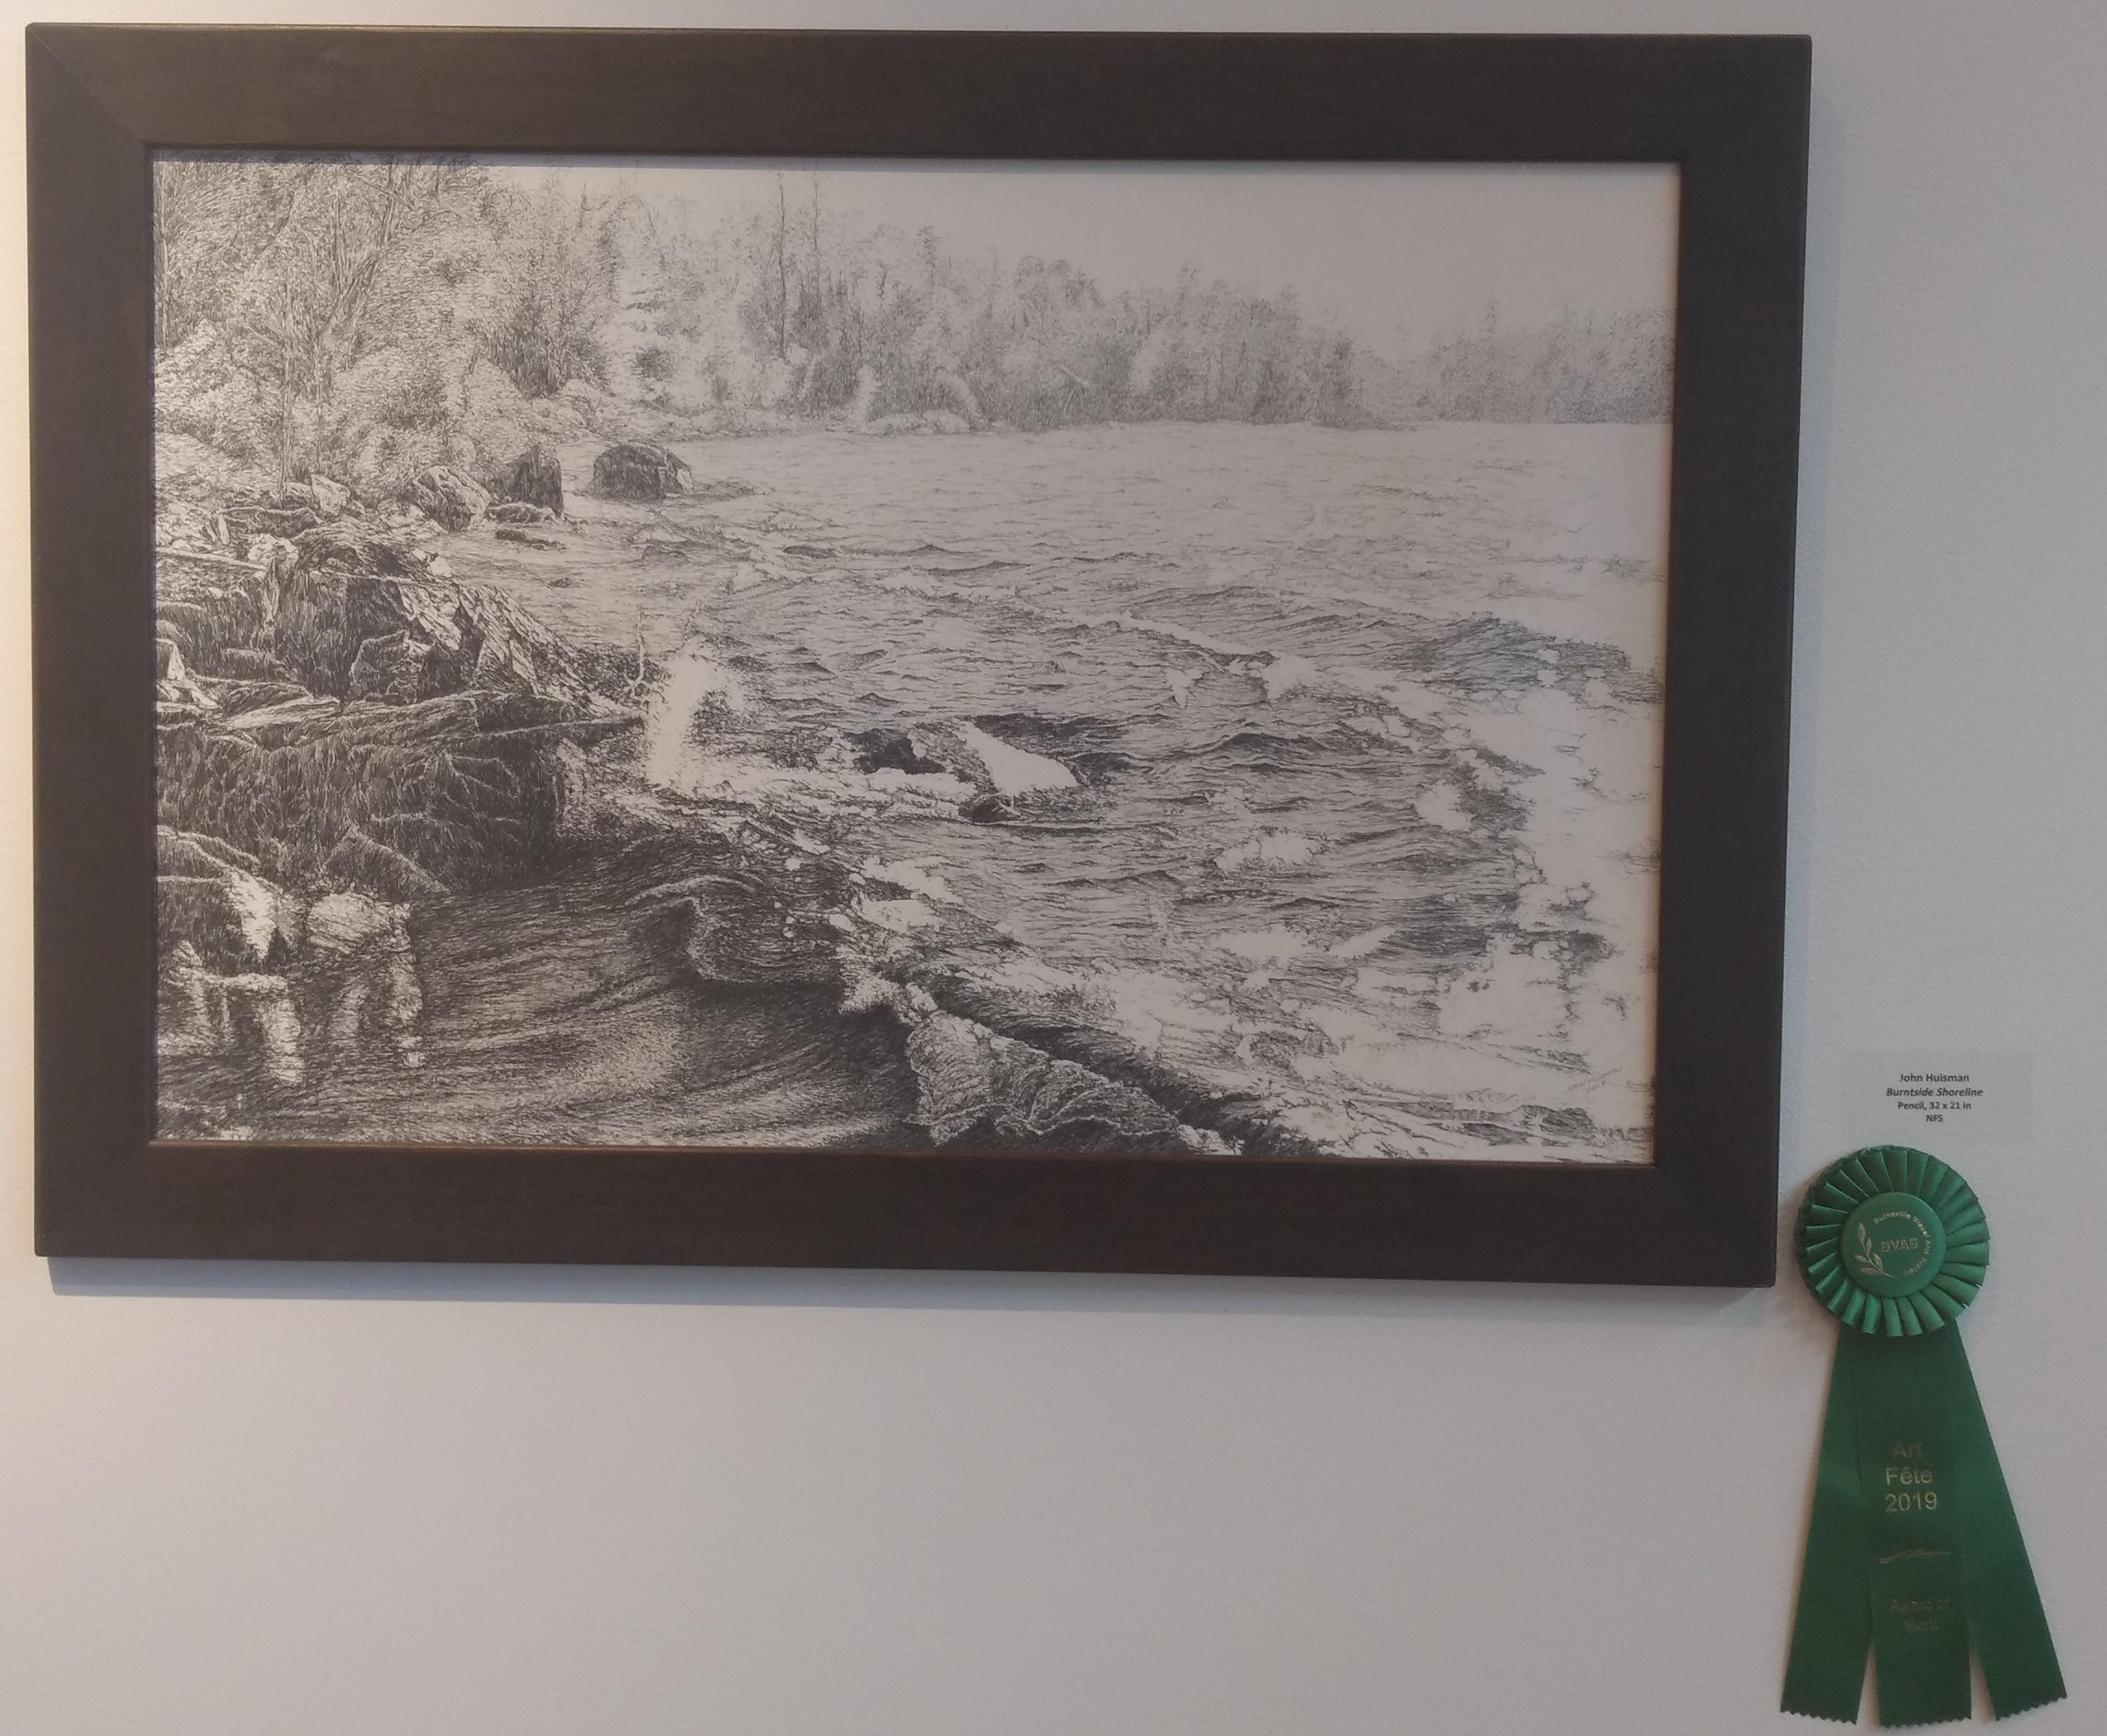 Burntside Shoreline, Pencil drawing, award of merit. 2019 BVAS Art fete